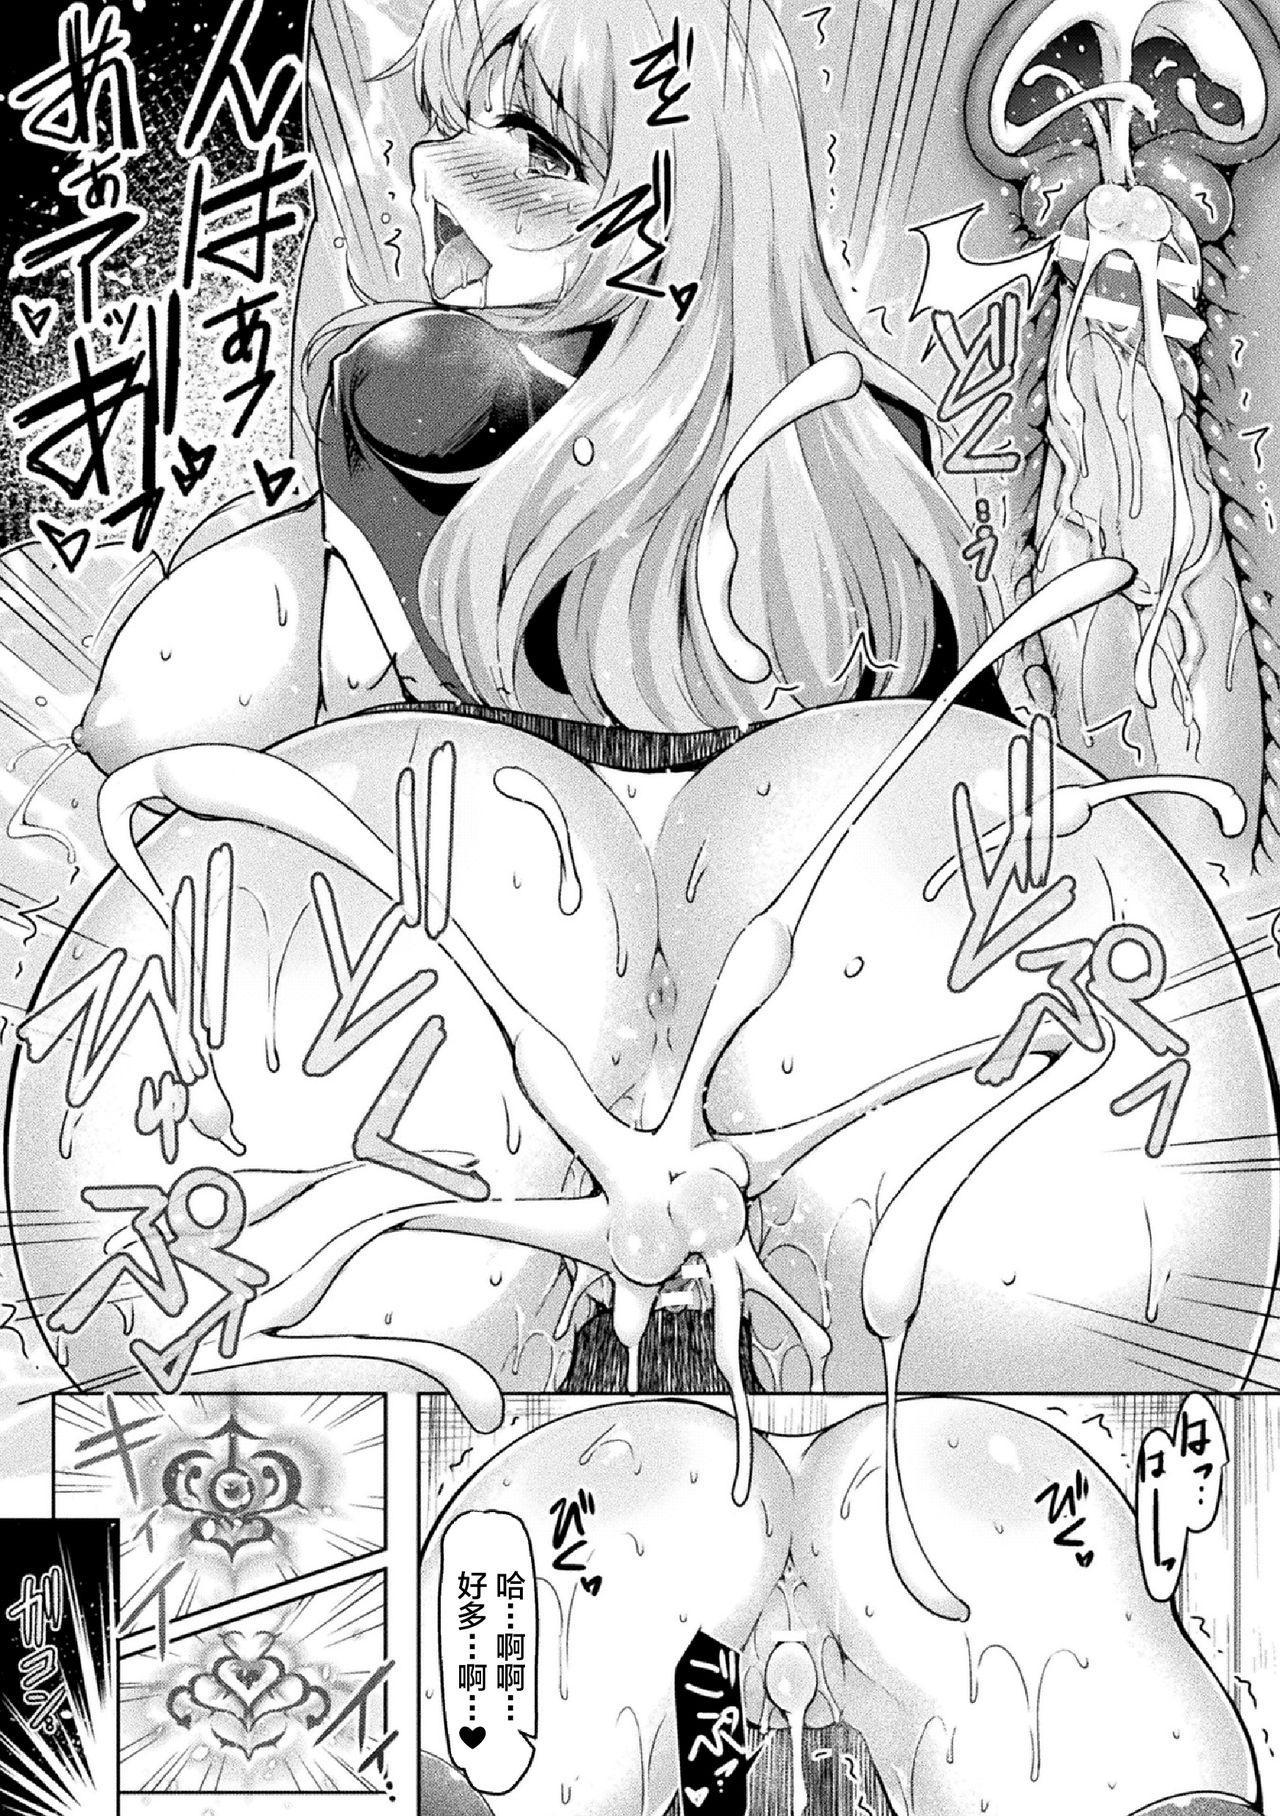 2D Comic Magazine Zecchou Kairaku ga Tomaranai Ero-Trap Dungeon Vol. 2 80